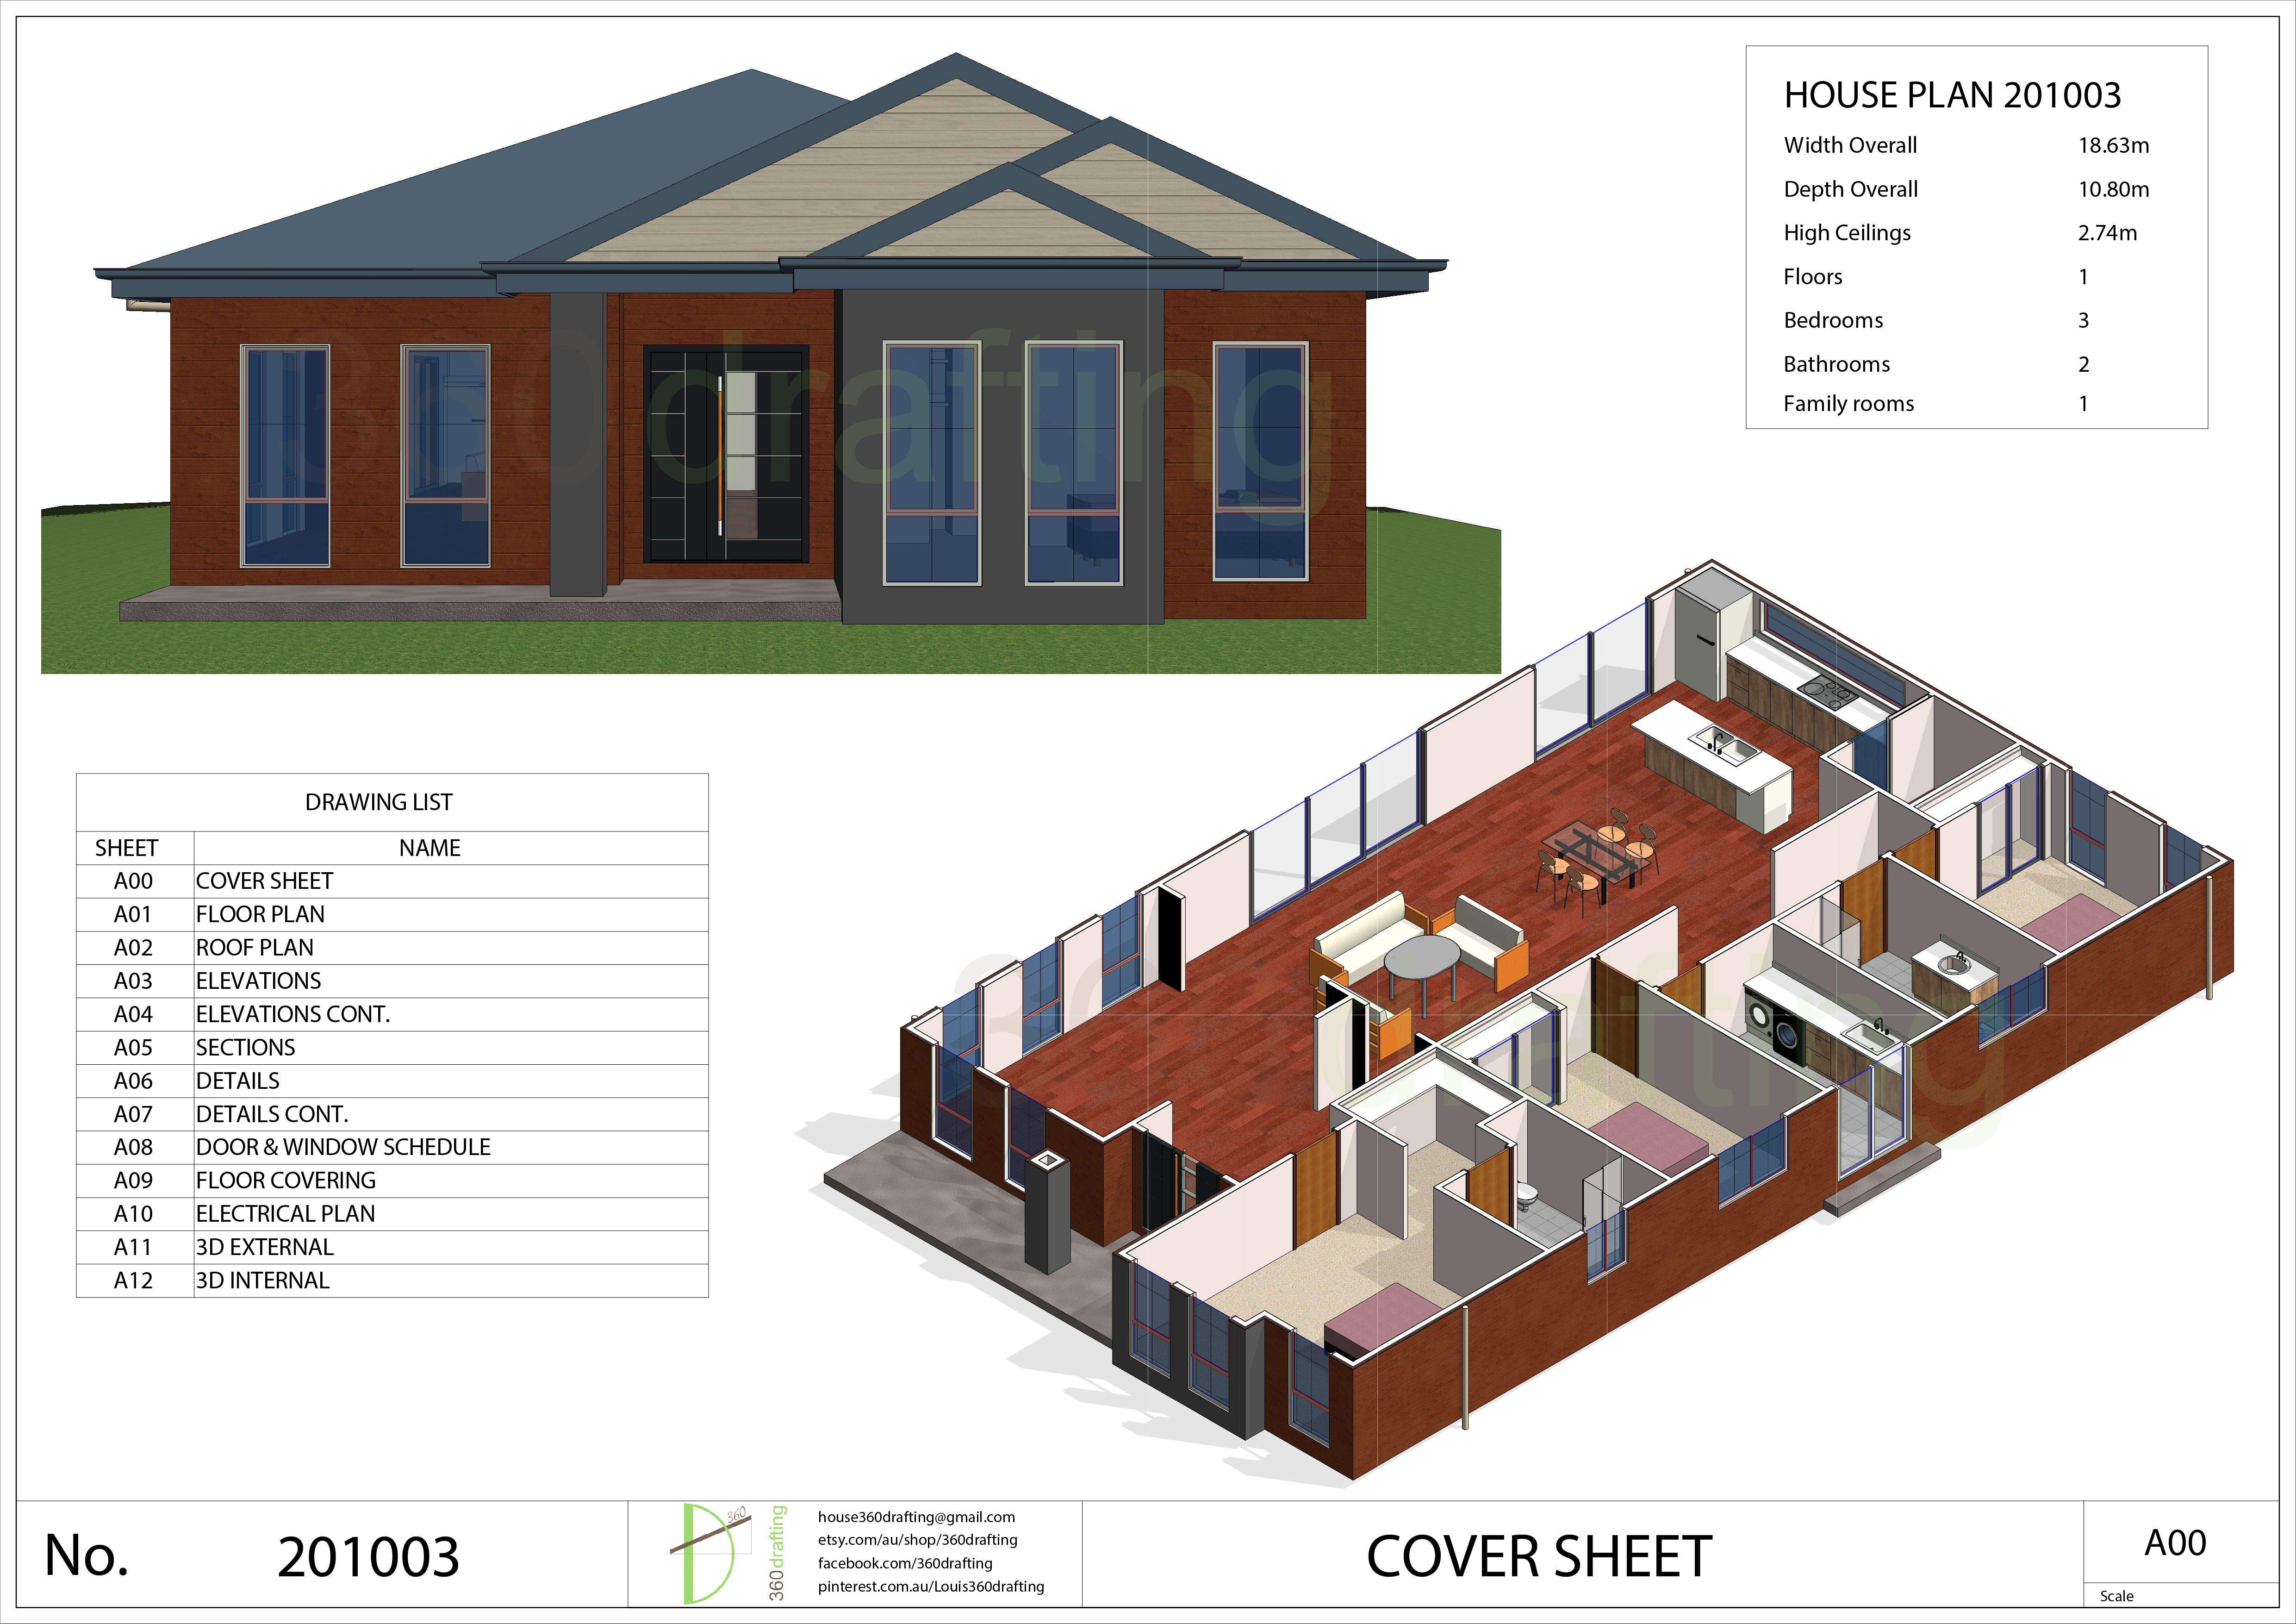 HOUSE PLAN 3 bedrooms 2 bathrooms pdf floor plan instant CUSTOM plans service